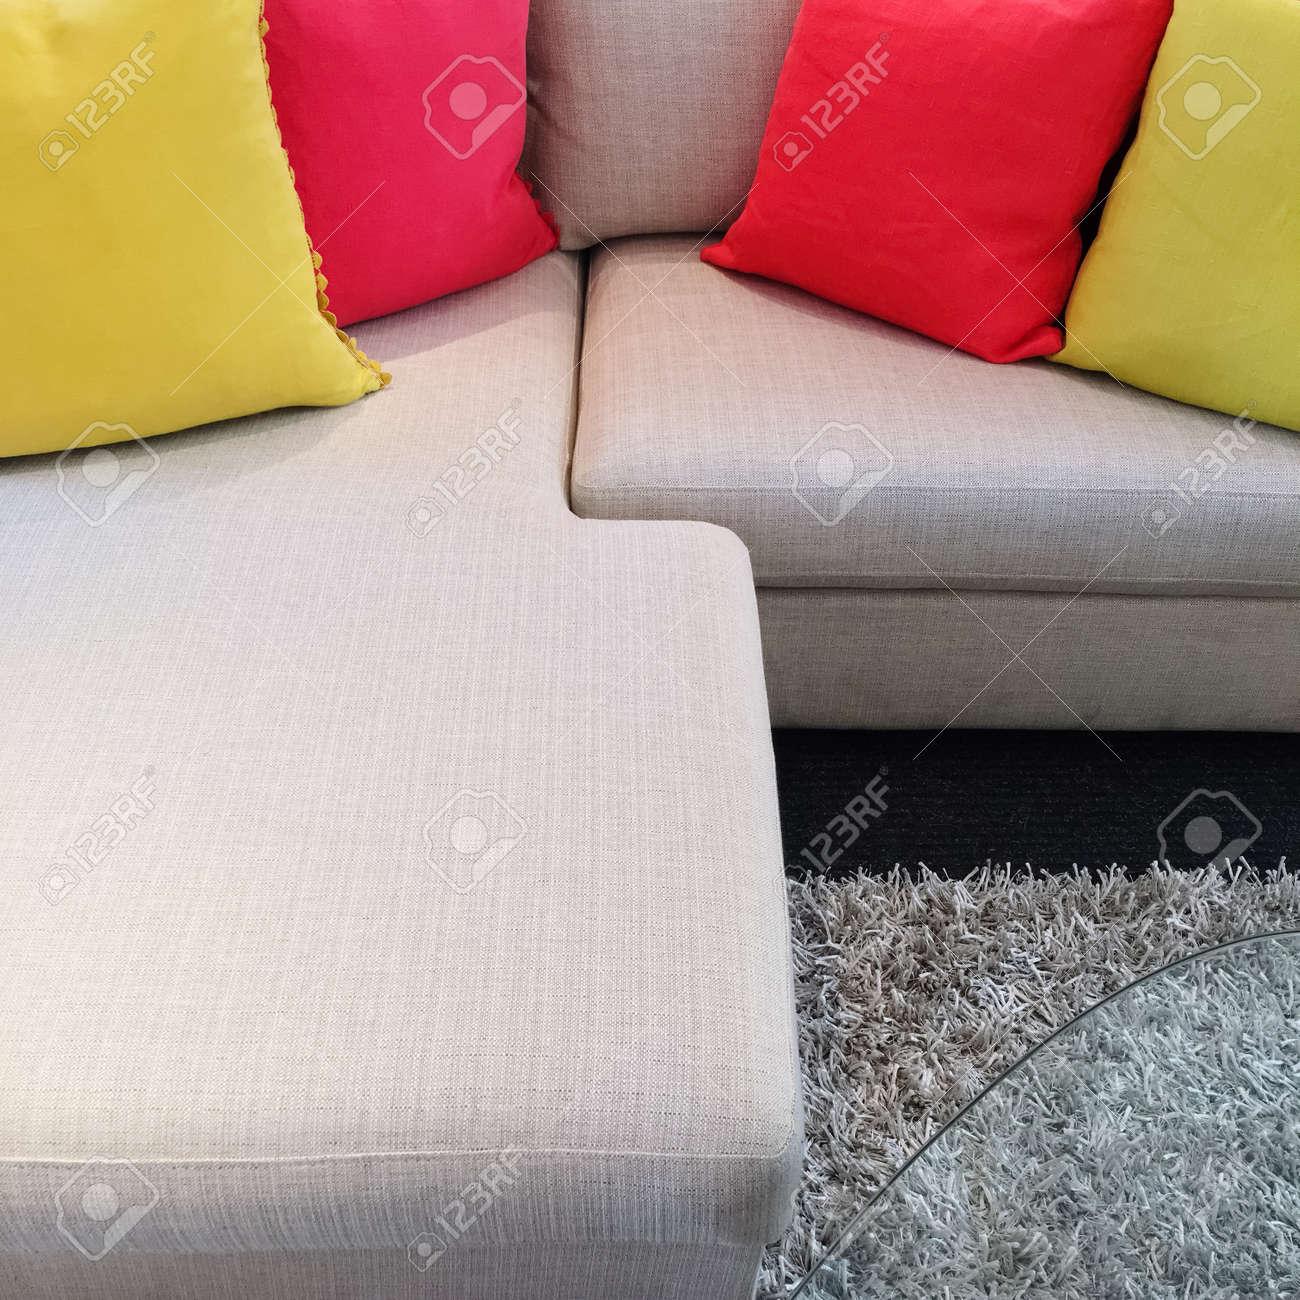 Bright red and yellow cushions decorating gray corner sofa.